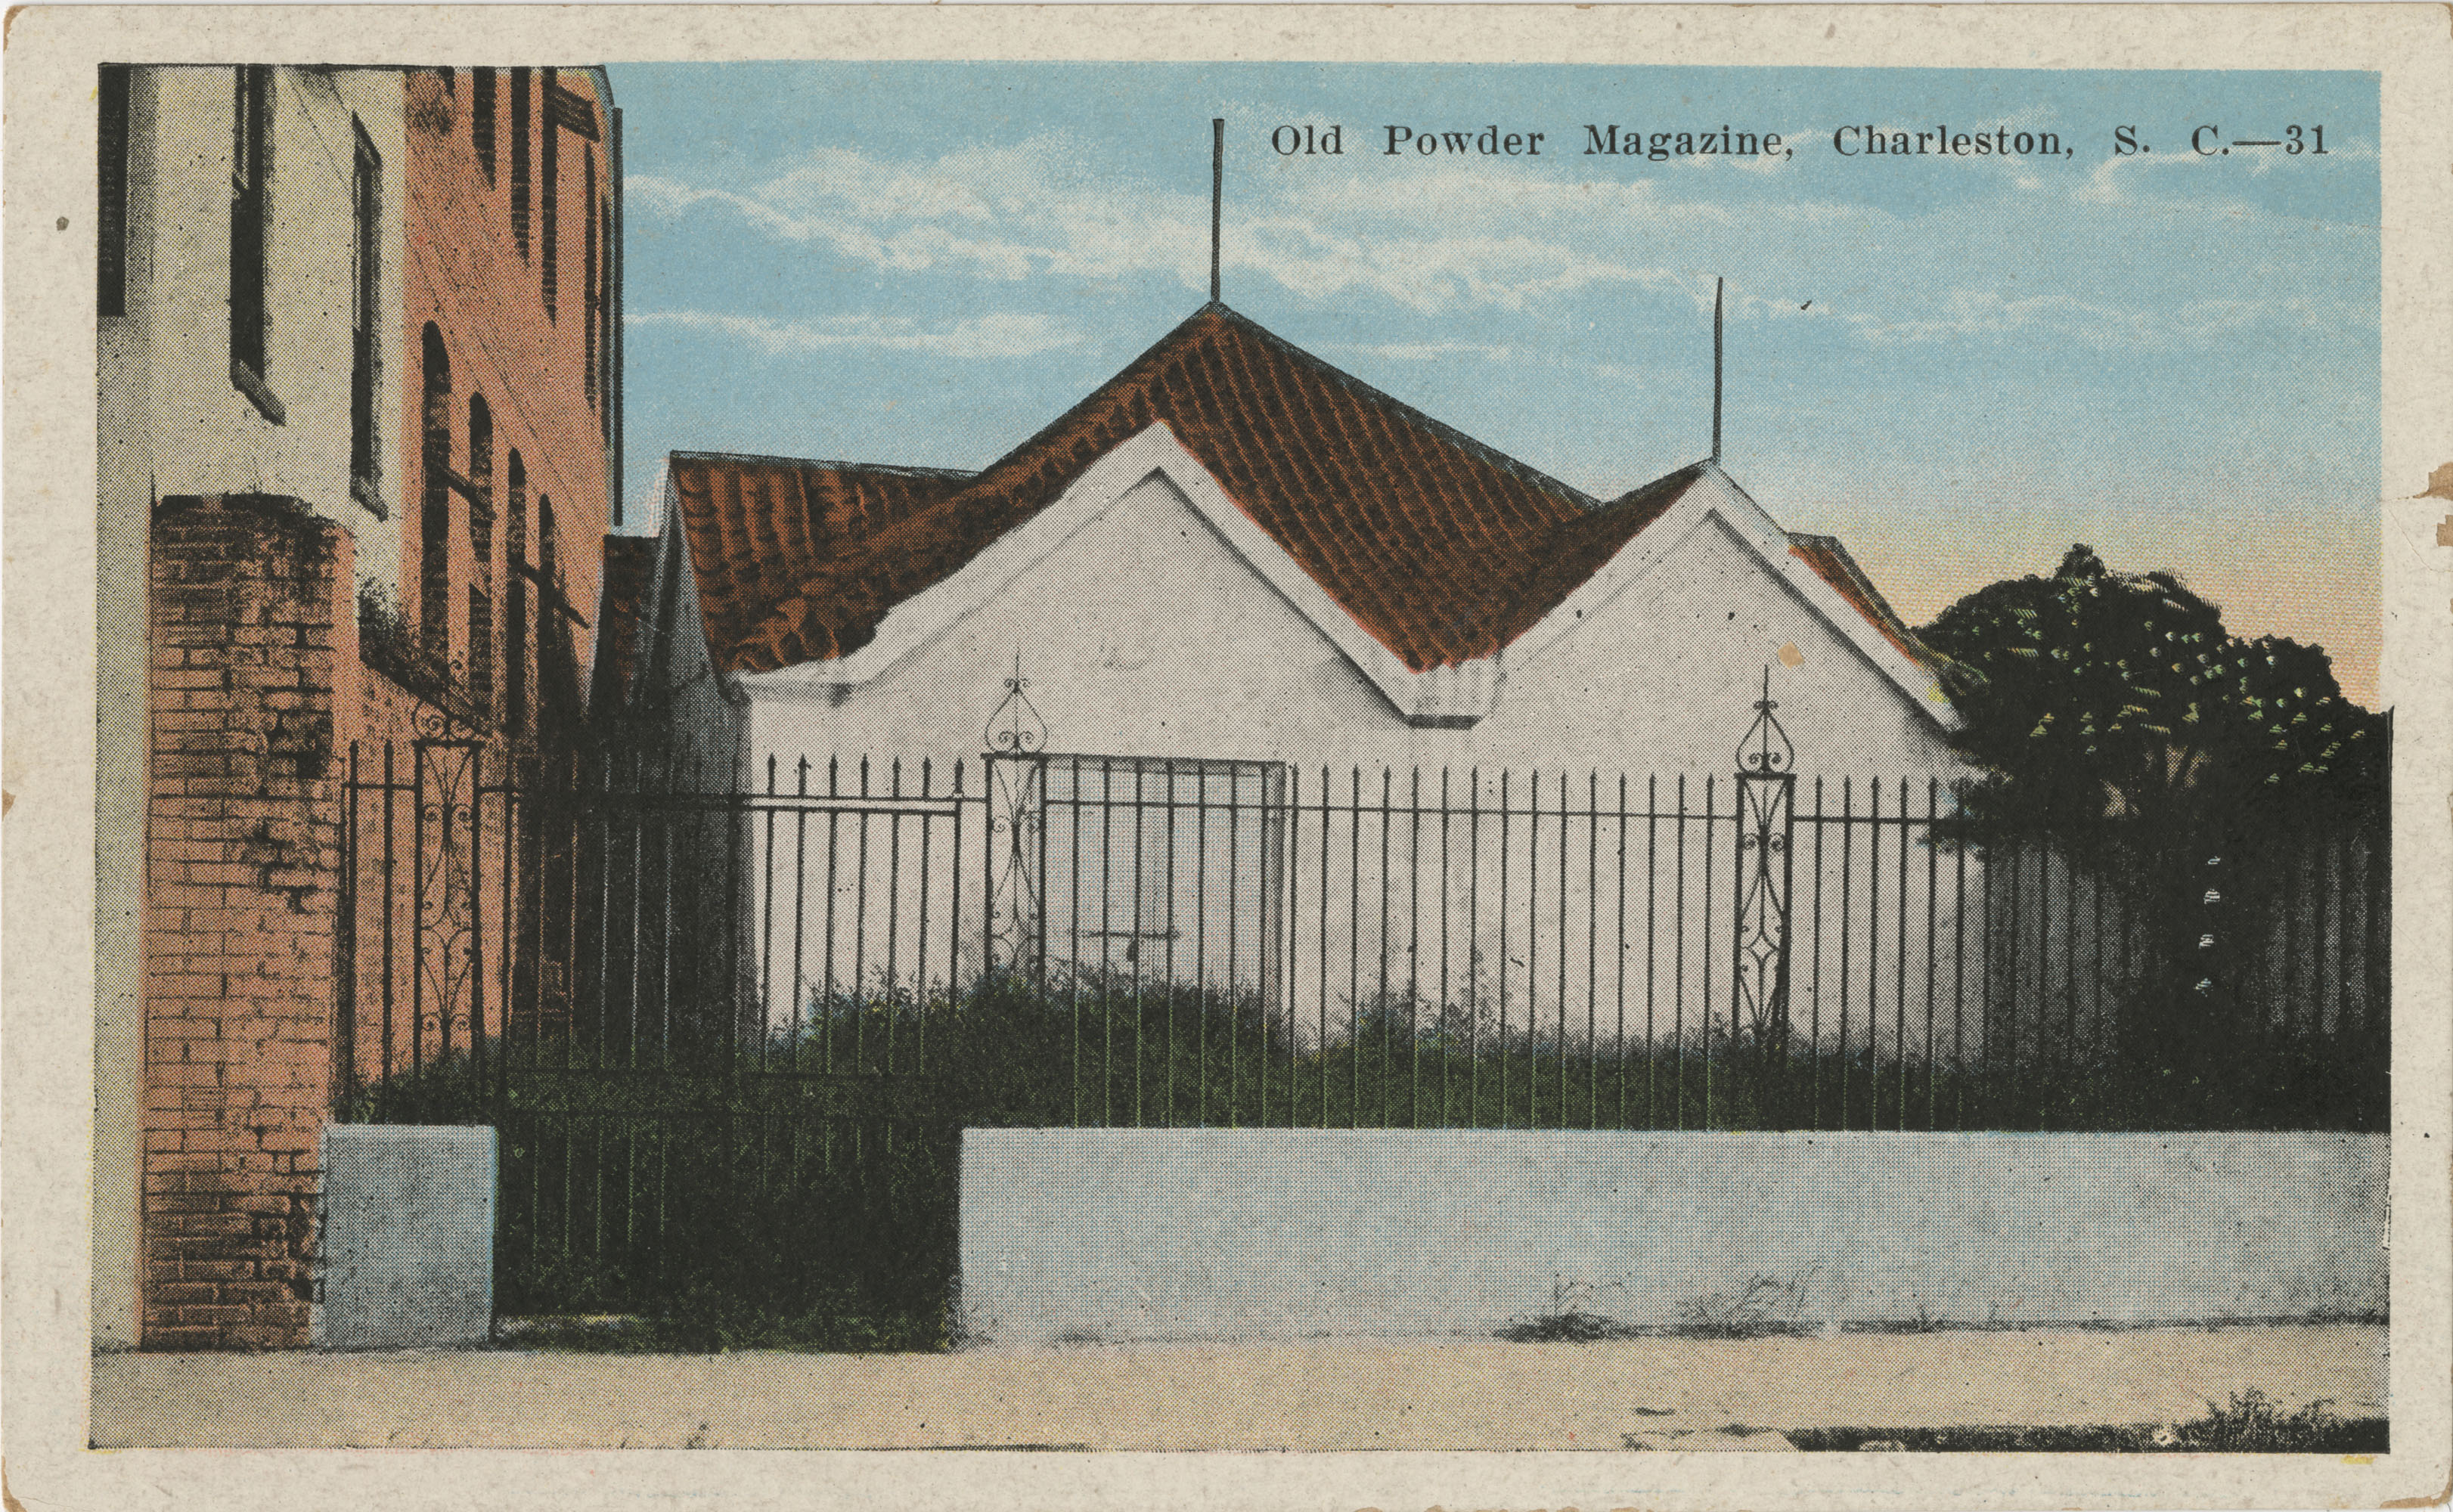 Old Powder Magazine, Charleston, S.C.